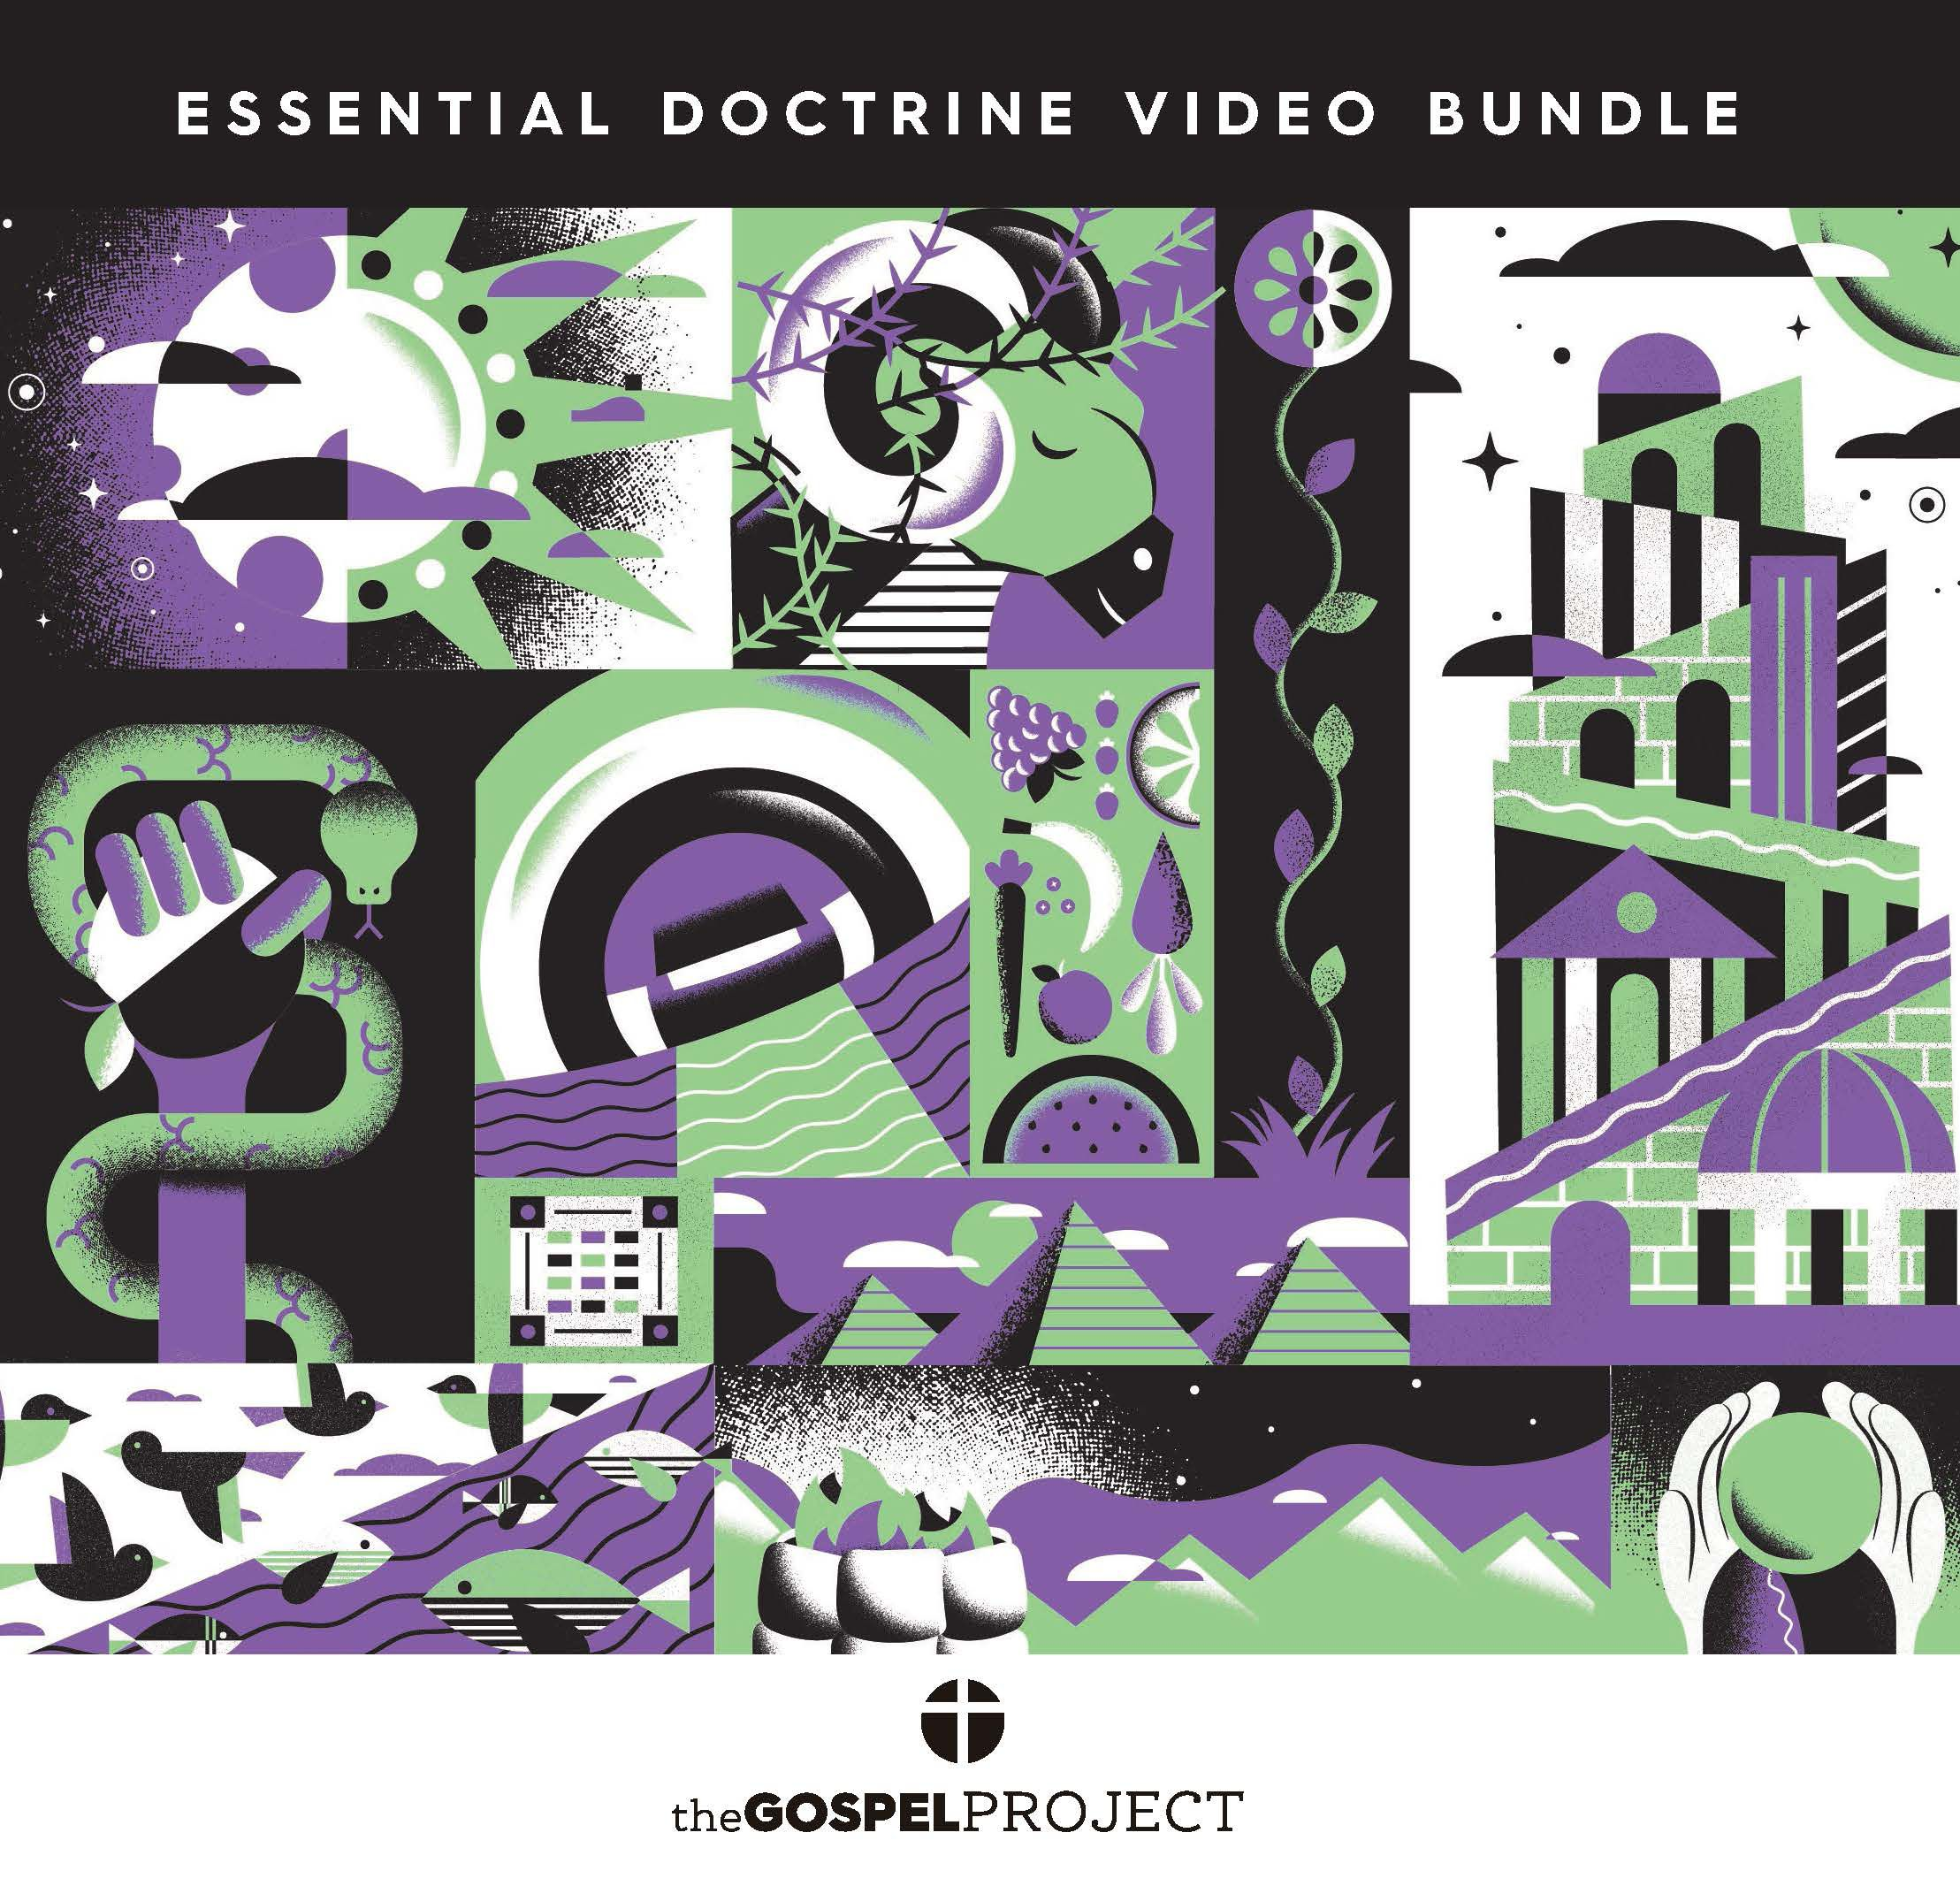 Essential Doctrine Video